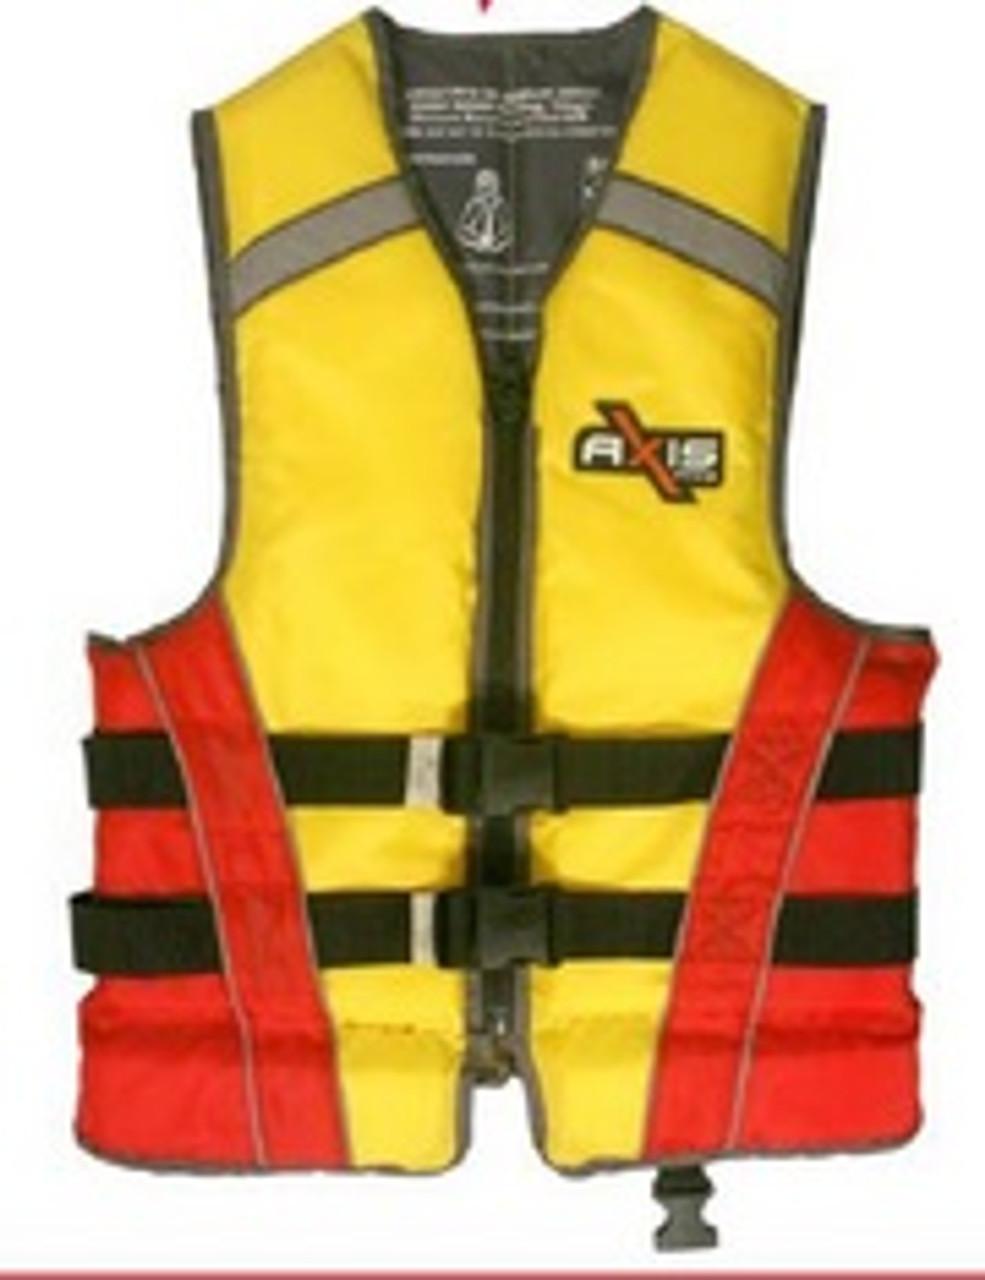 Large Adult Lifejacket L50